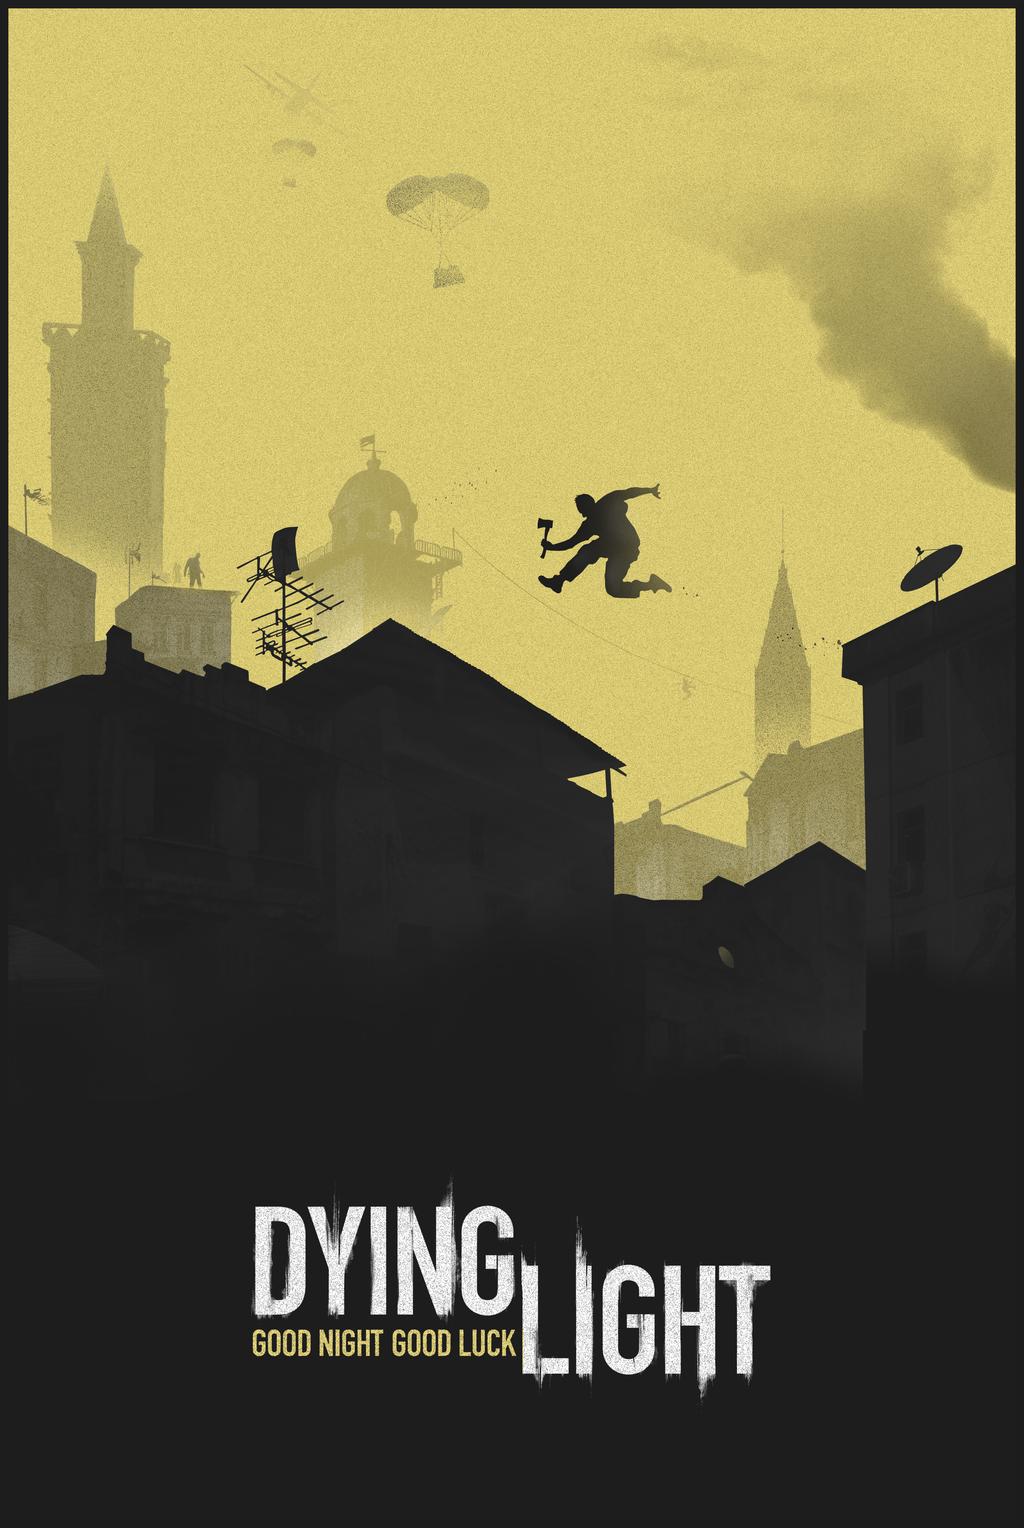 Dying Light Mobile Wallpaper - WallpaperSafari